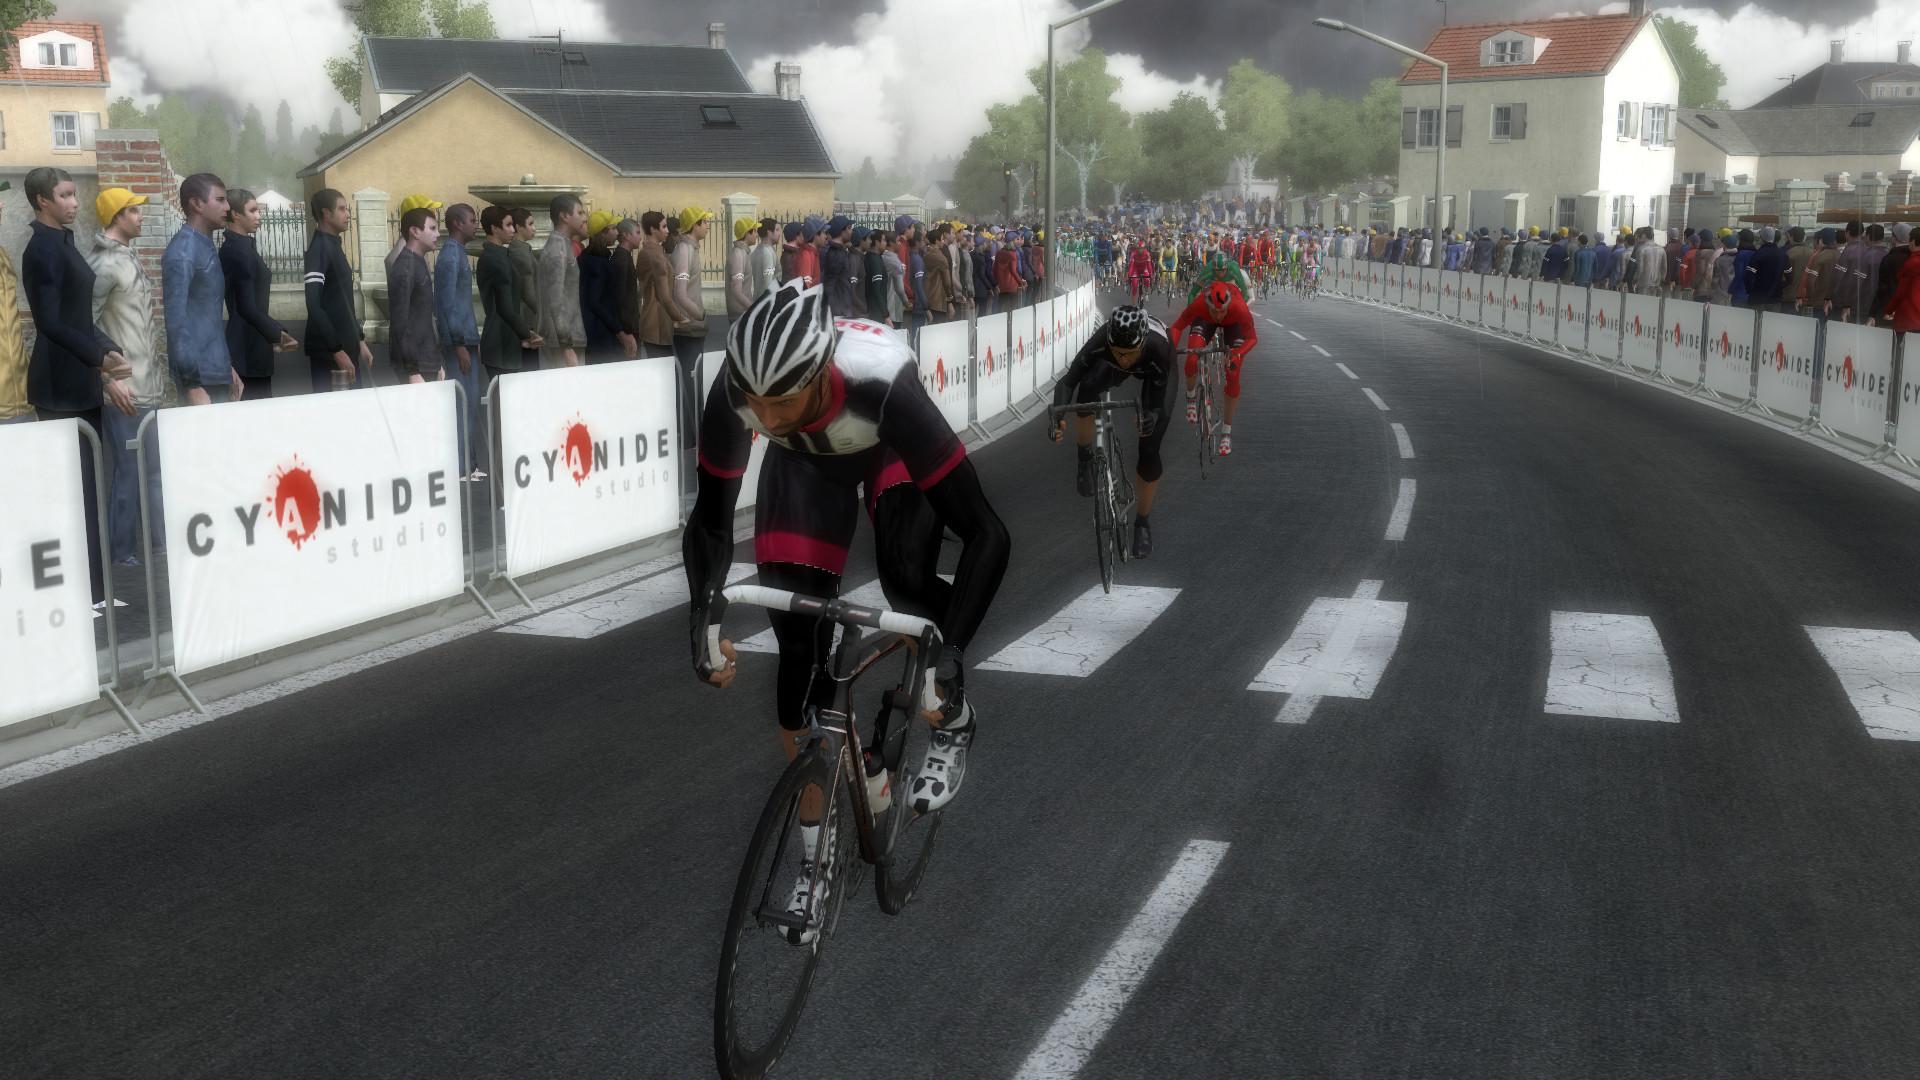 pcmdaily.com/images/mg/2019/Races/PTHC/Pologne/E5/02.jpg